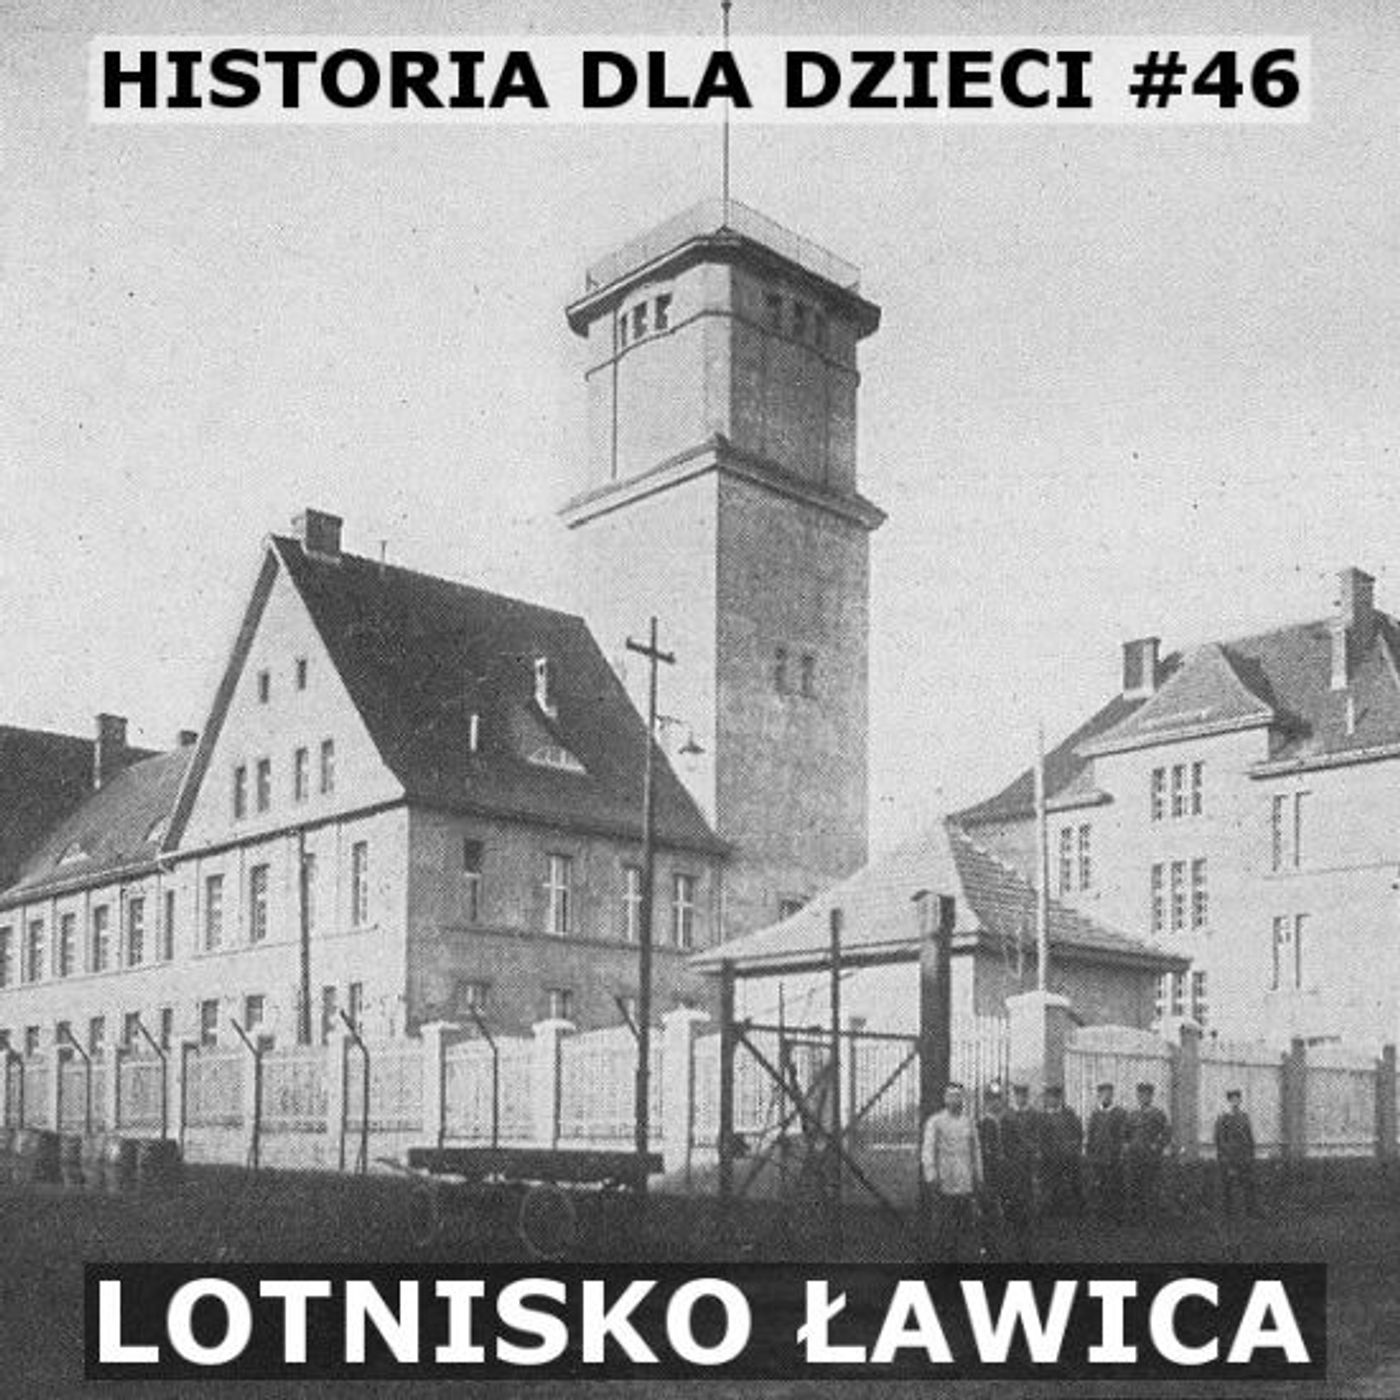 46 - Lotnisko Ławica